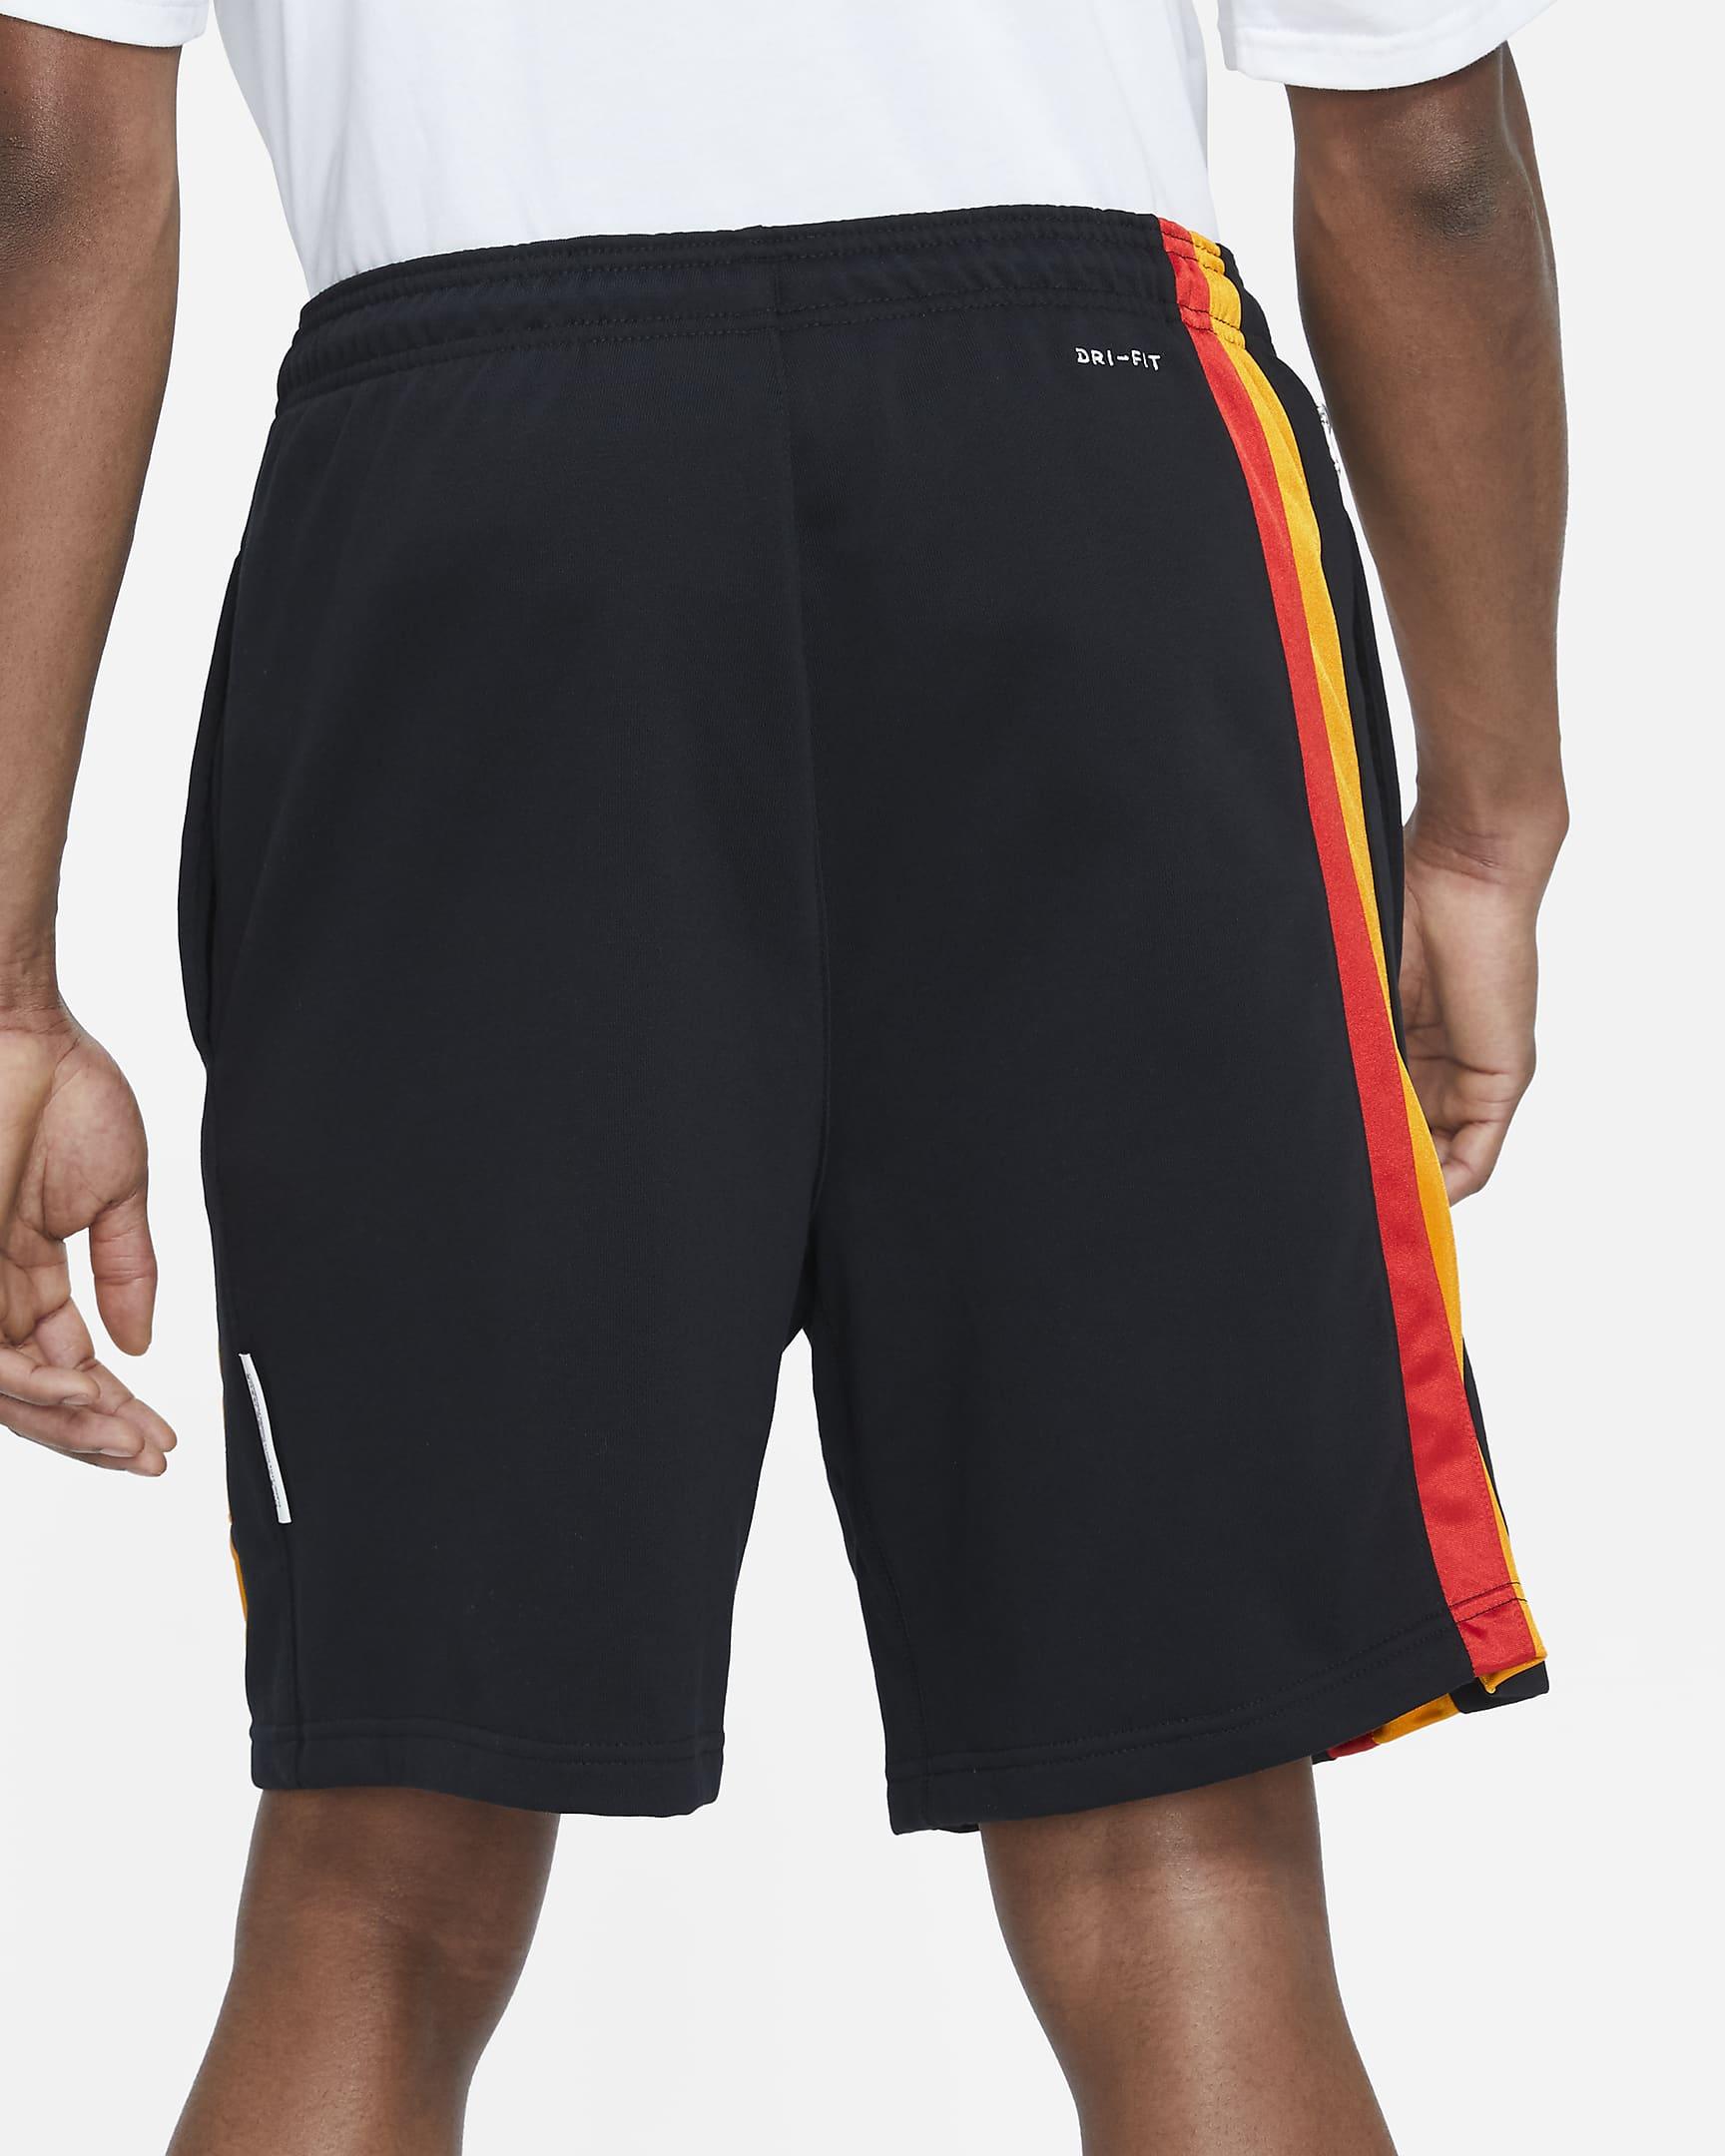 dri-fit-rayguns-mens-premium-basketball-shorts-V329rk-5